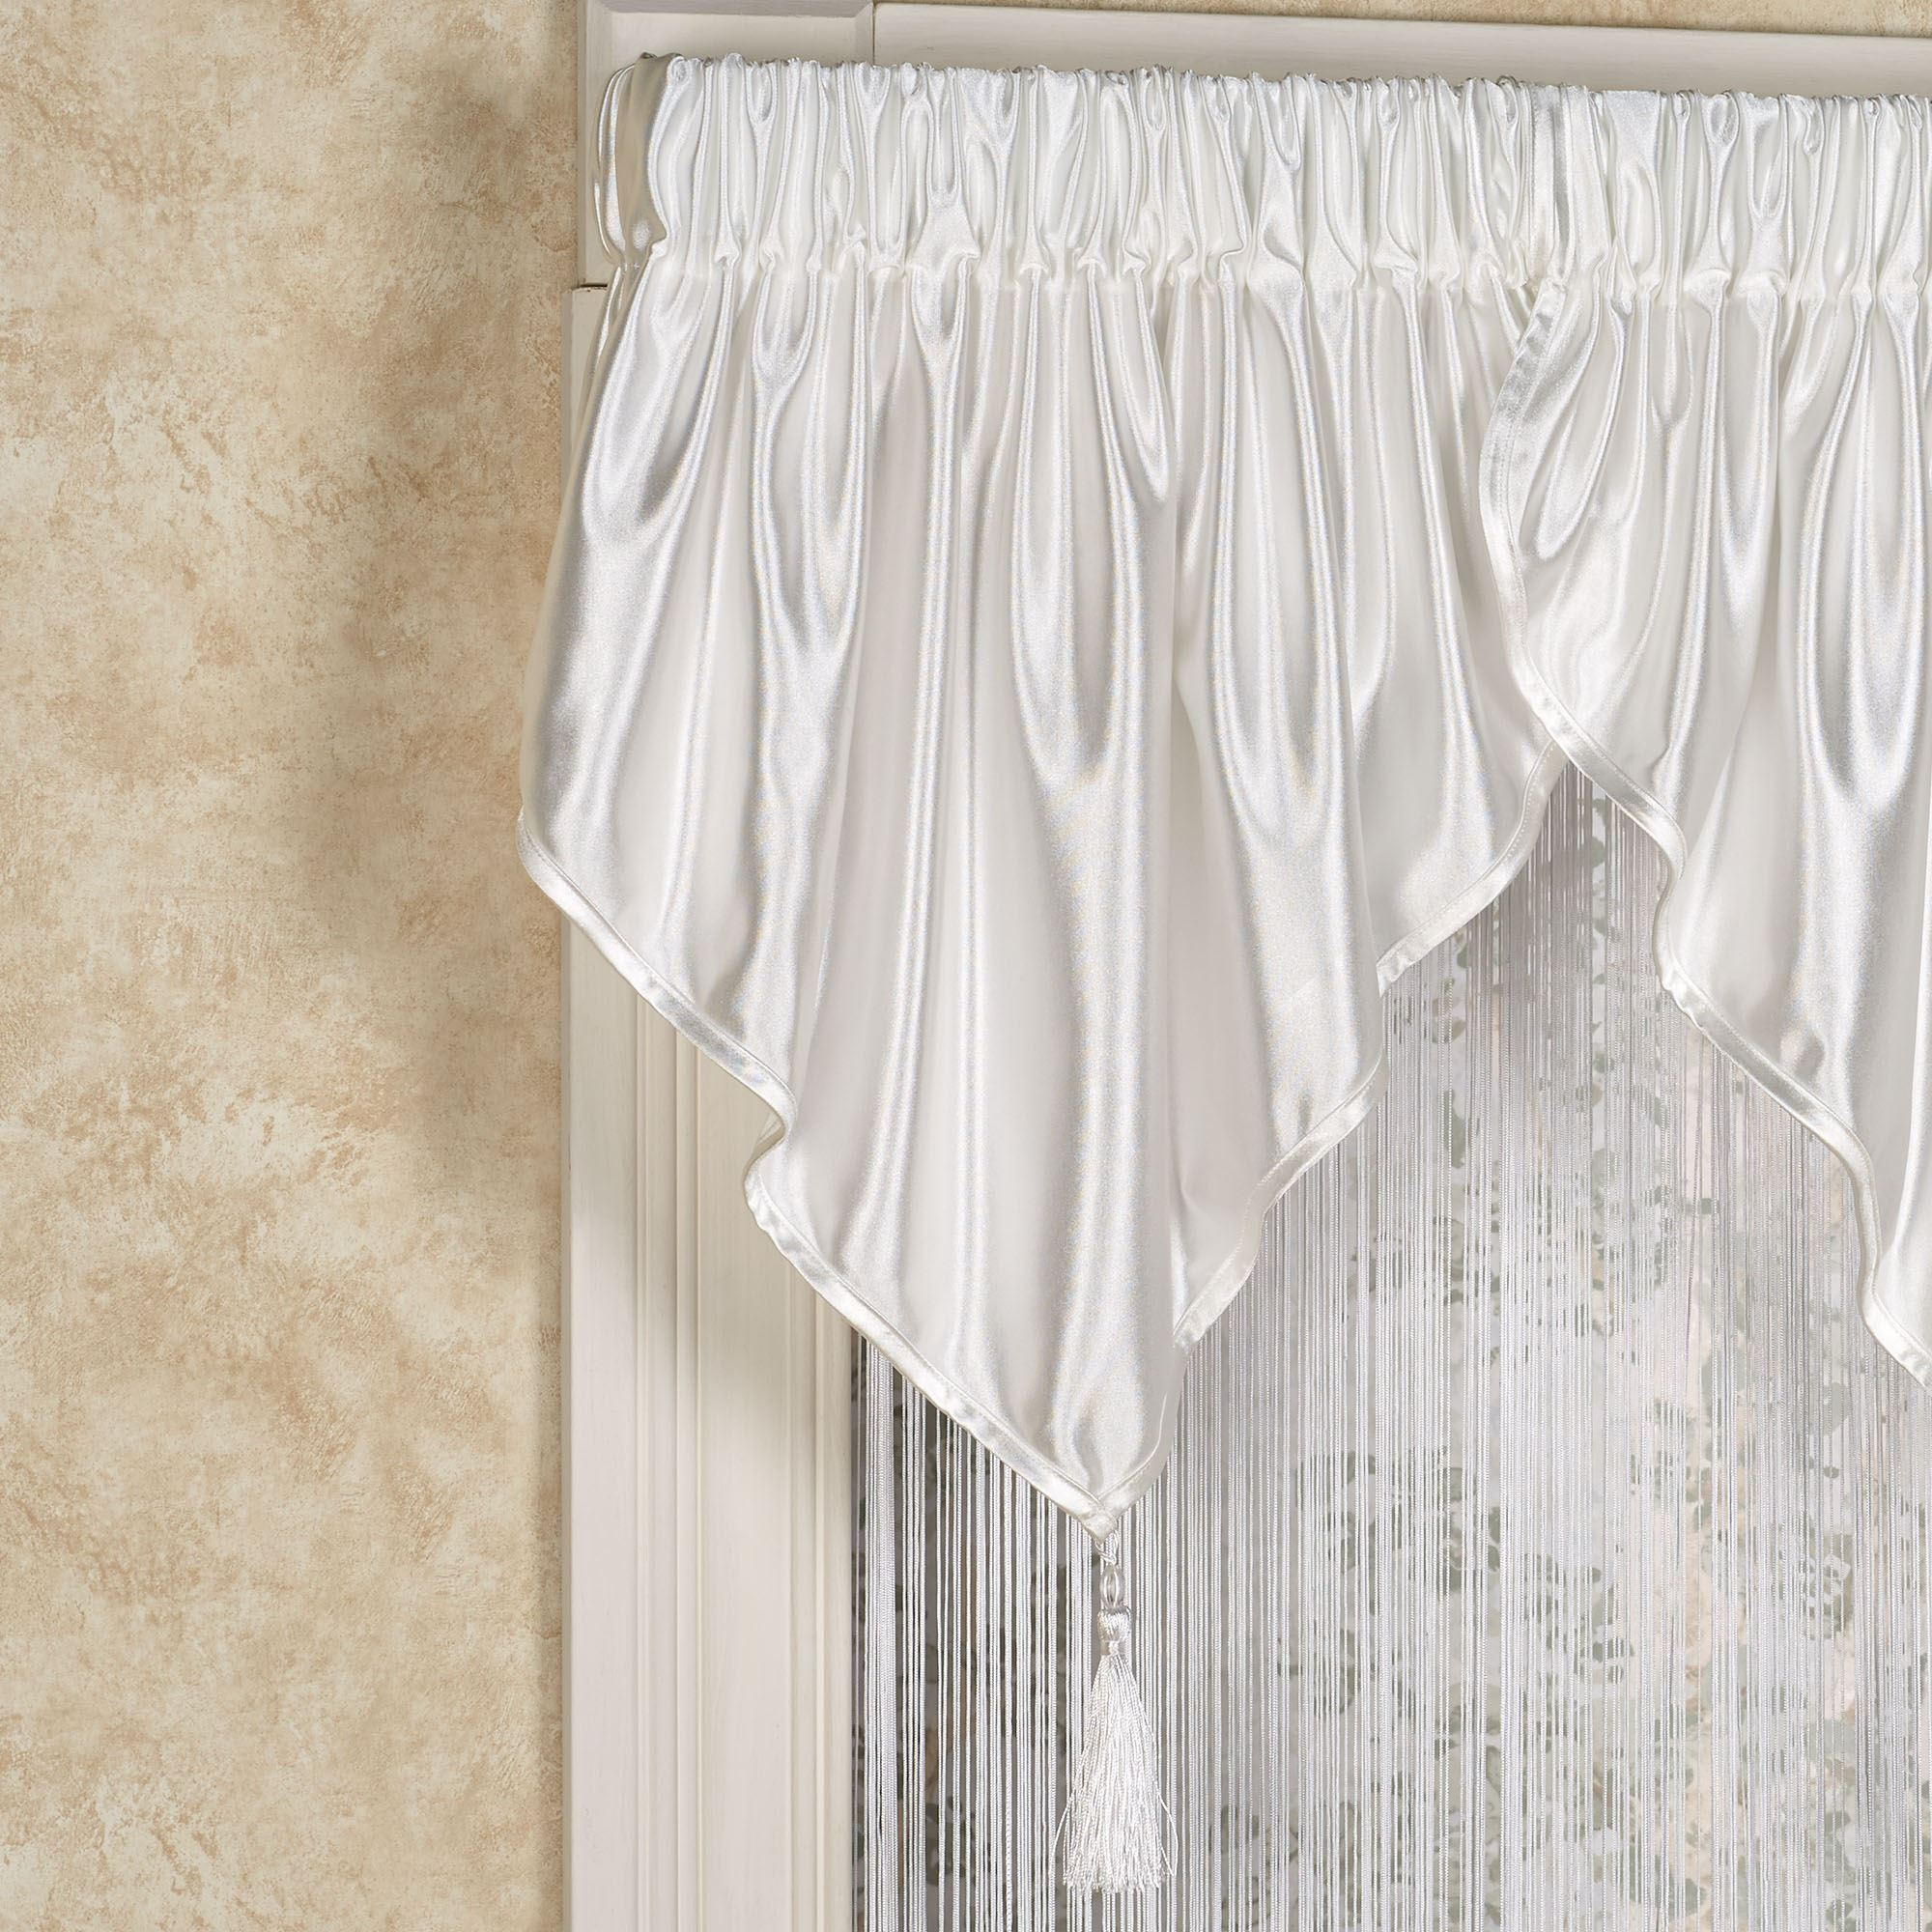 Shimmer Satin Ascot Valance Window Treatment